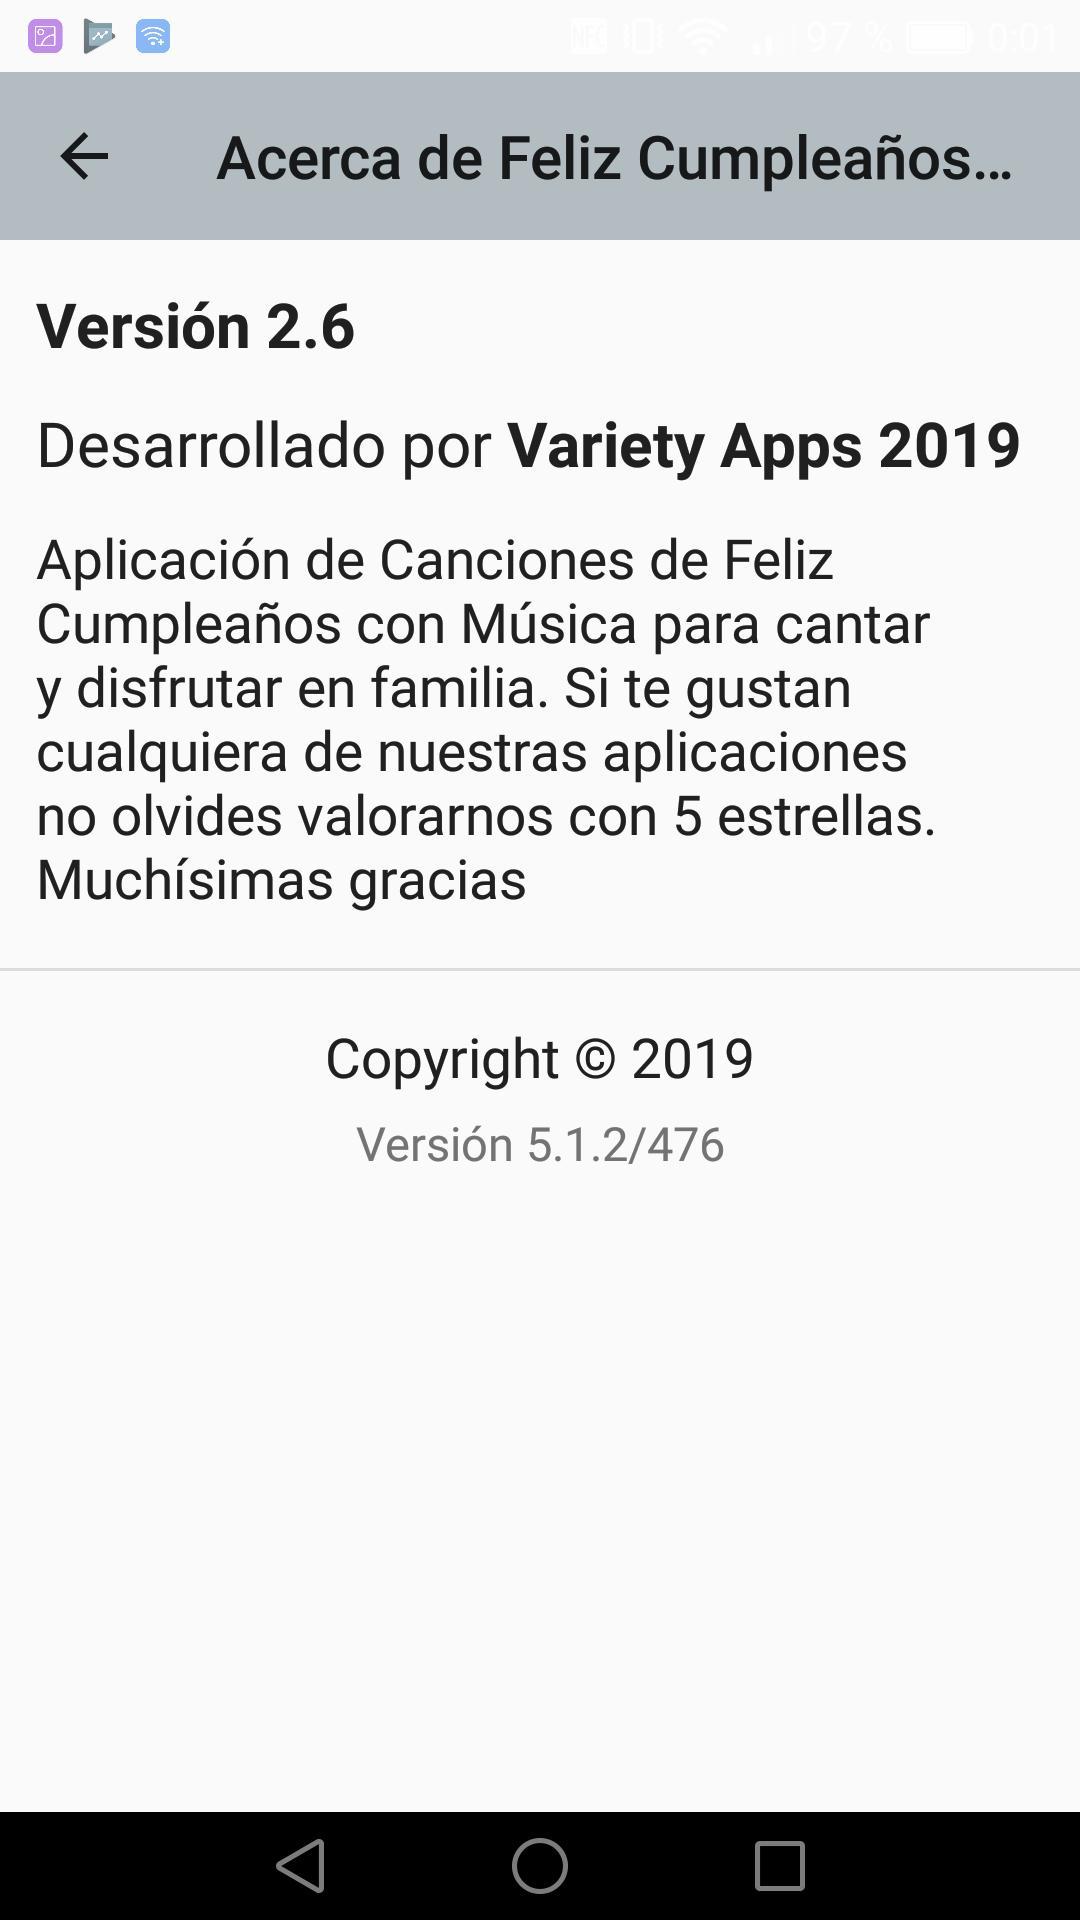 Cancion Cumpleanos.Feliz Cumpleanos Con Musica For Android Apk Download